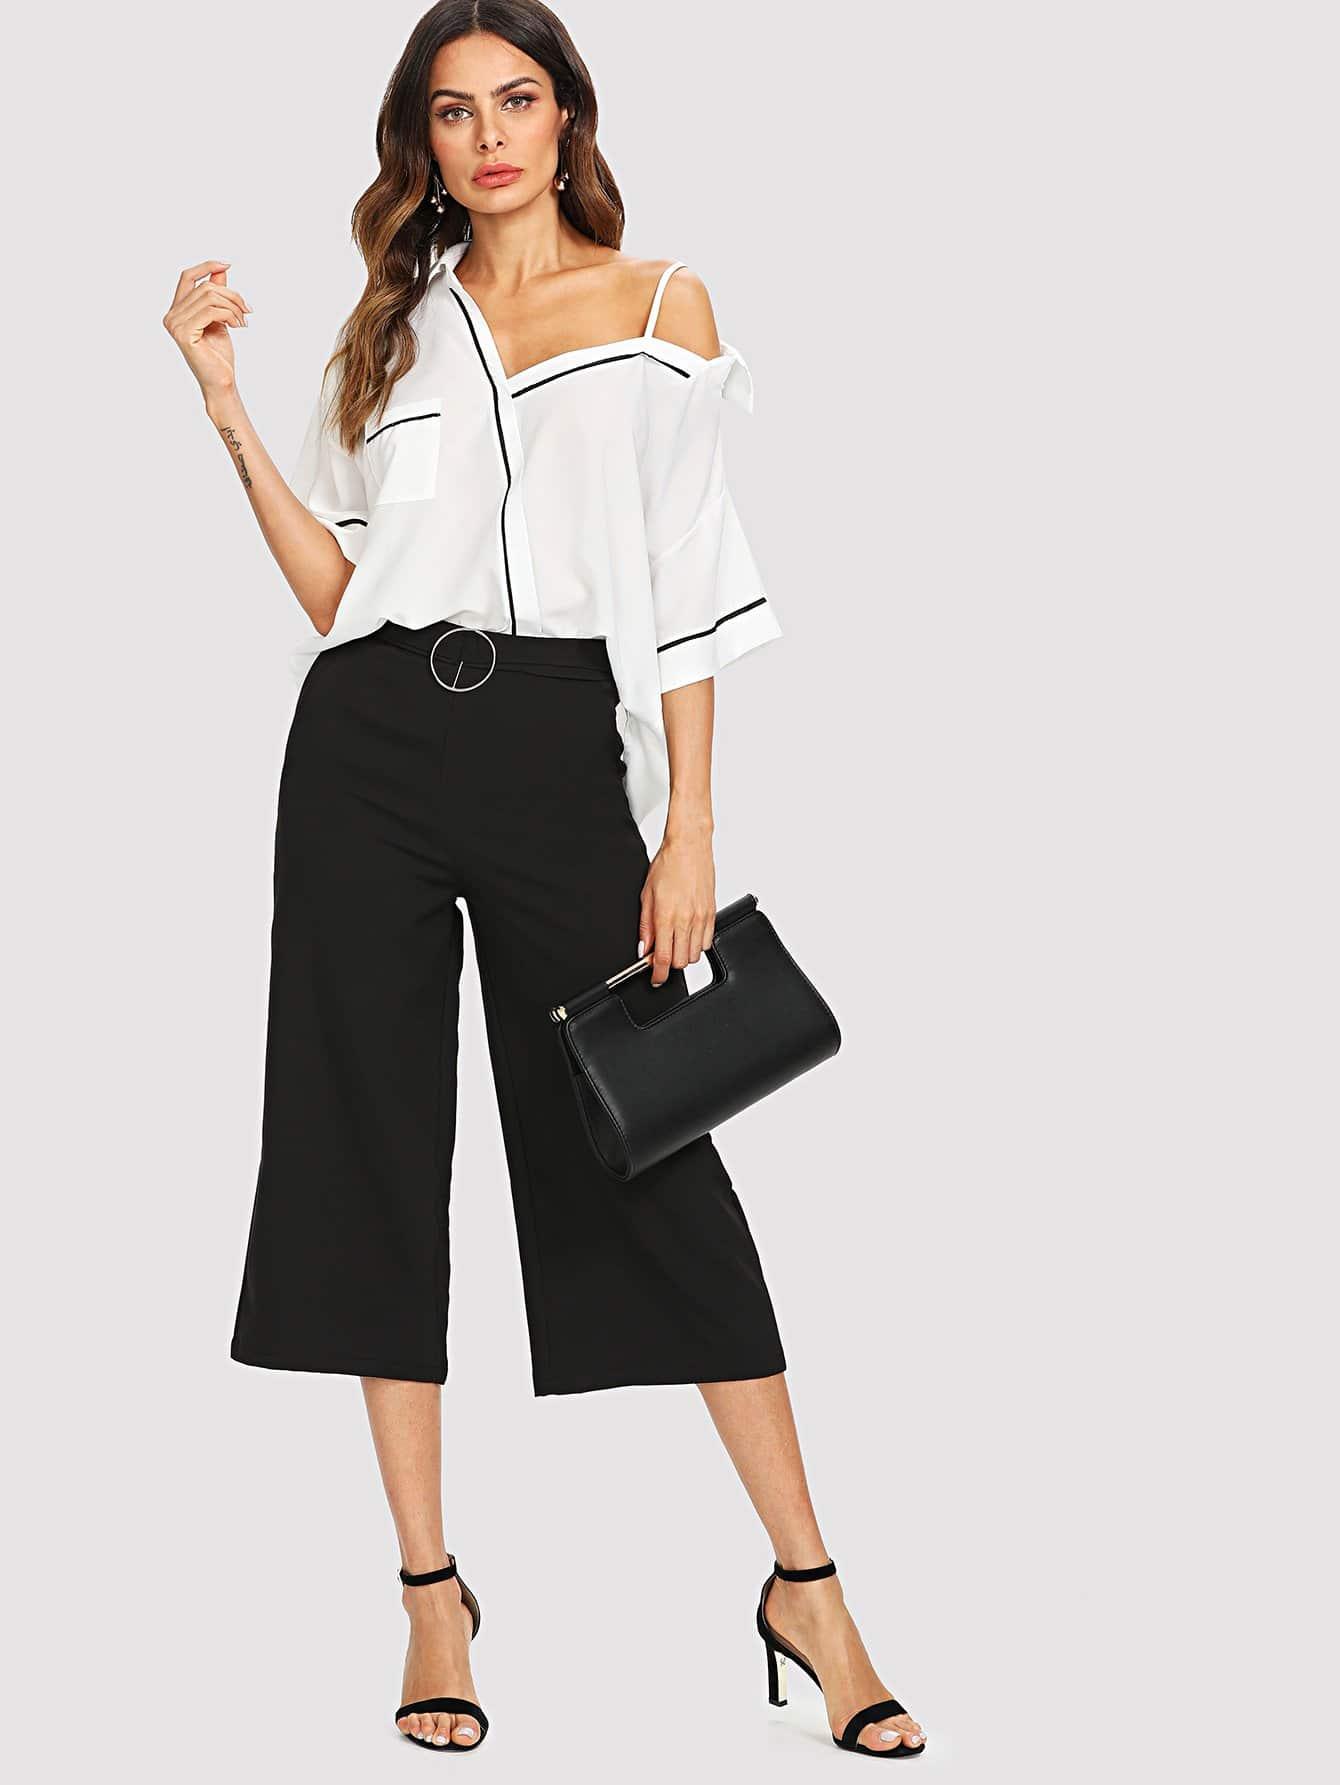 Contrast Binding Open Shoulder Shirt & Wide Leg Pants open wide 23